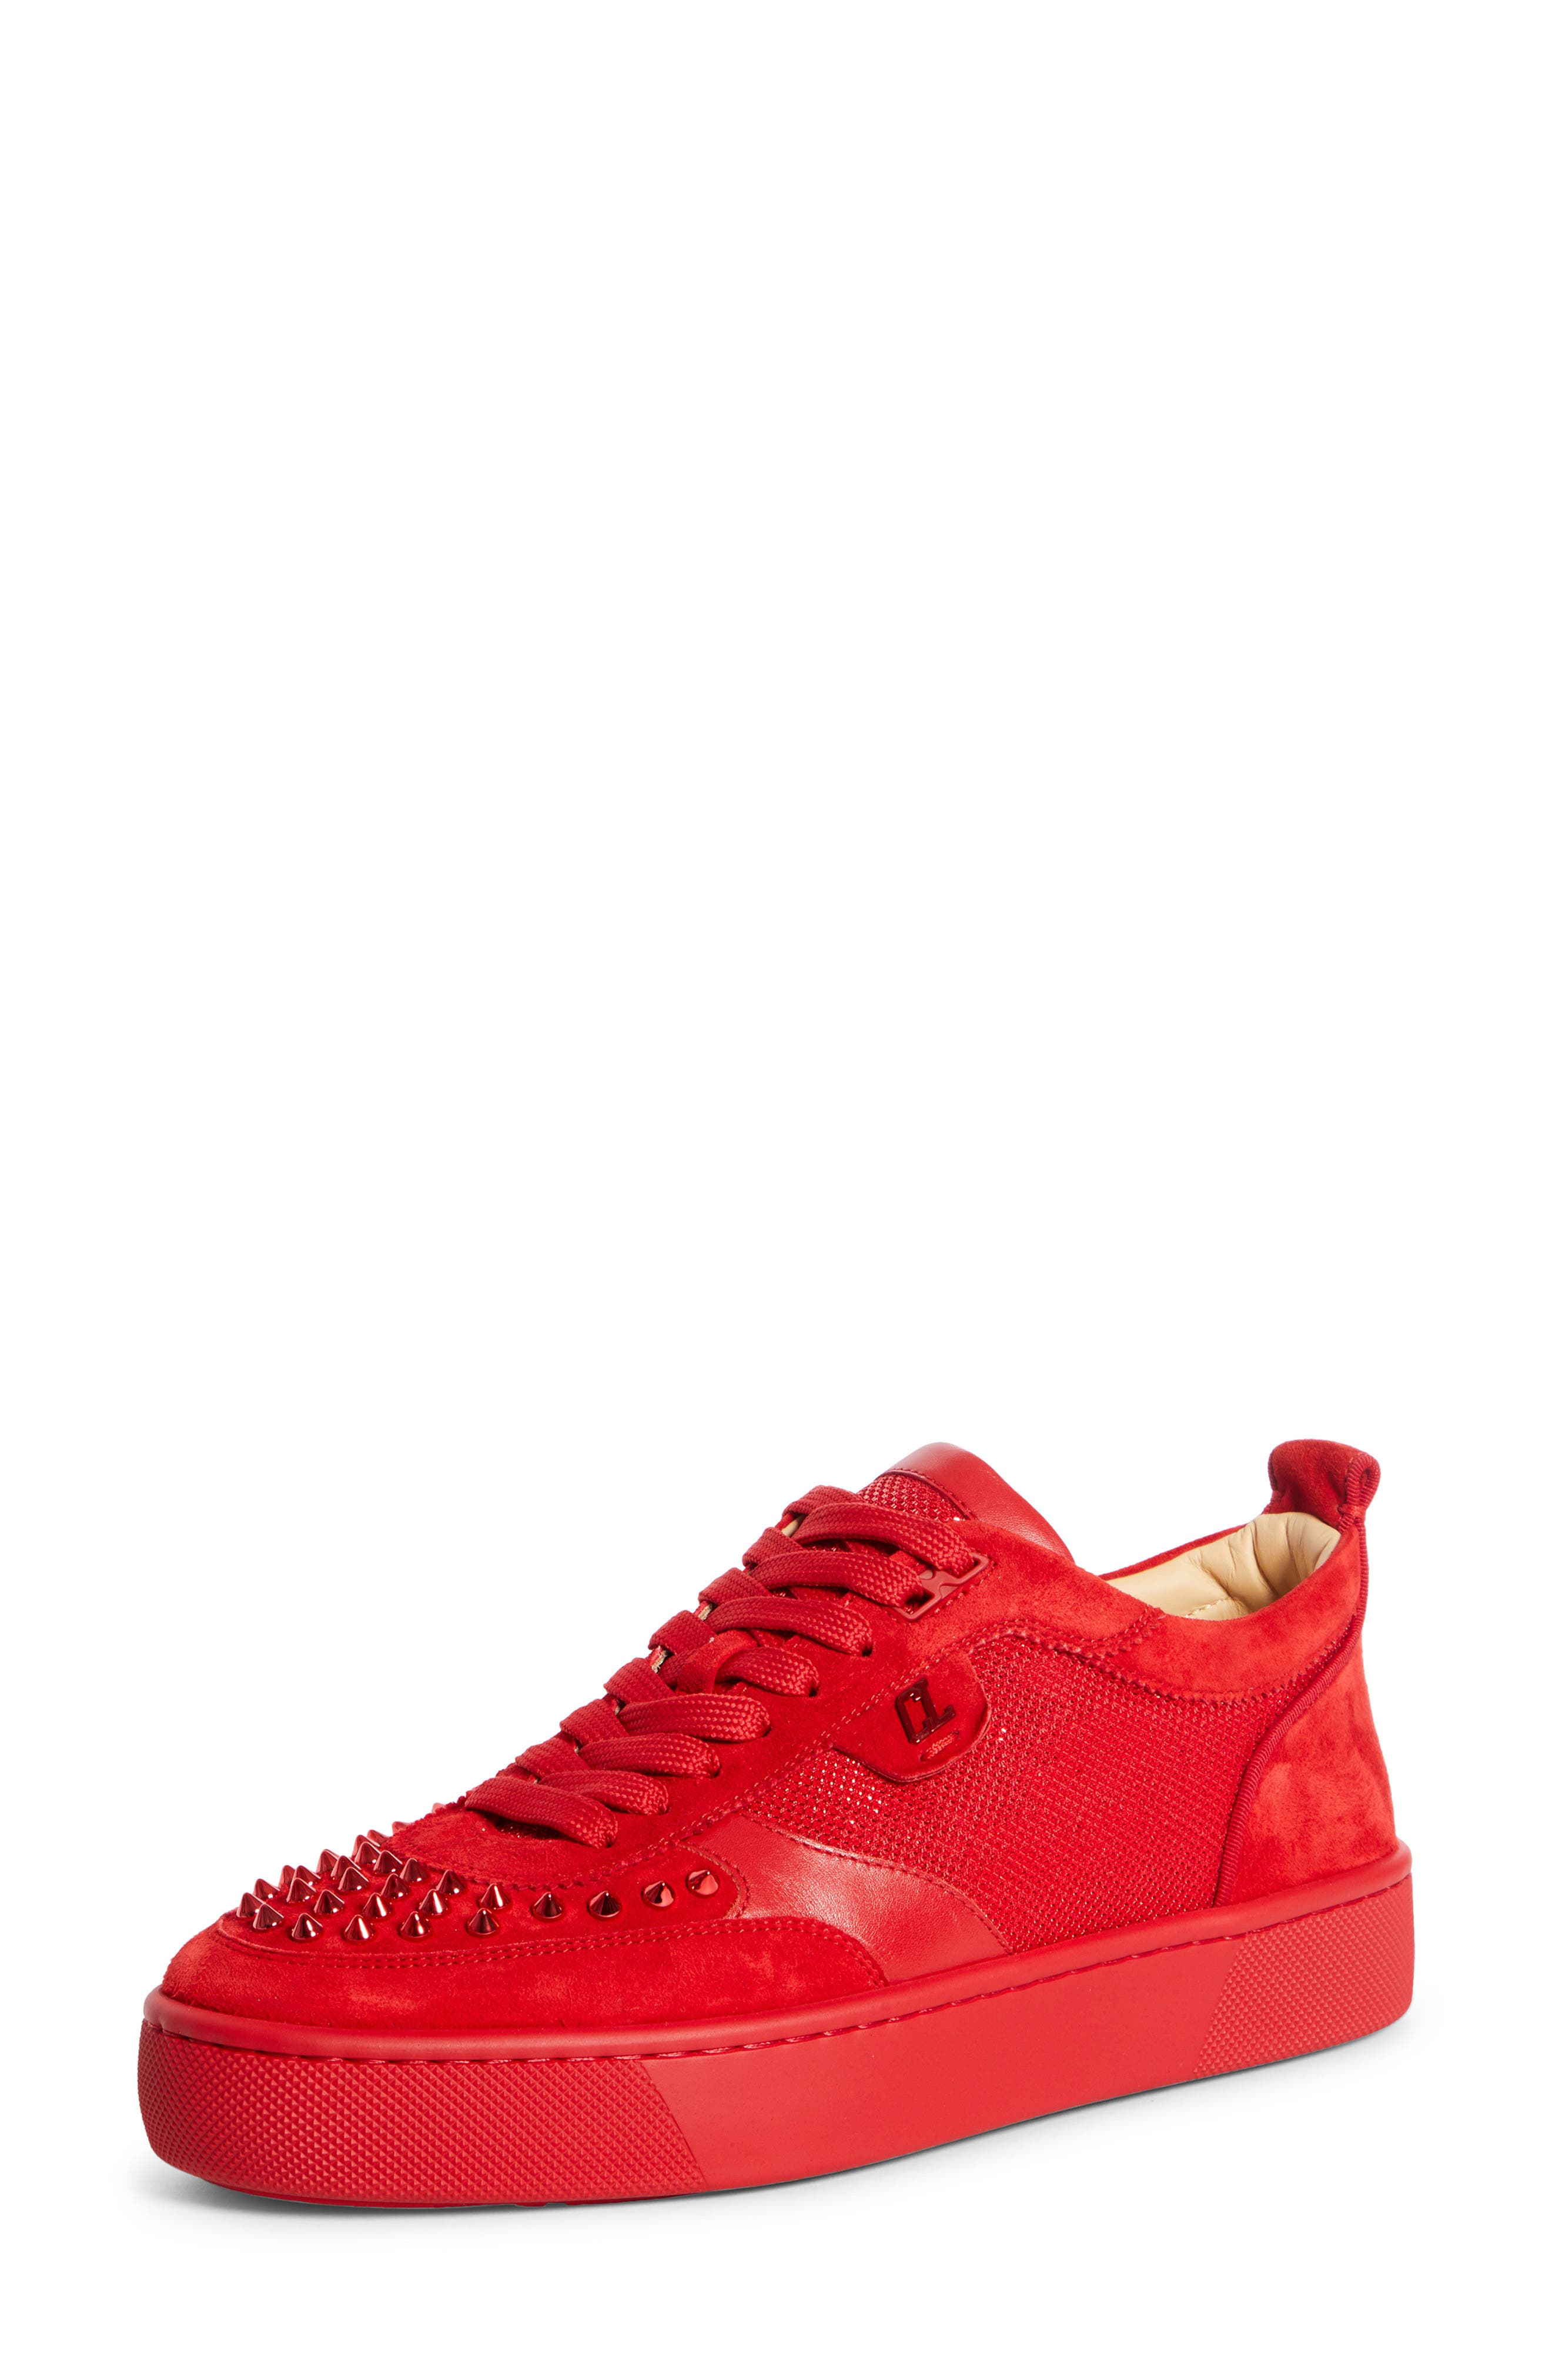 Men's Christian Louboutin Shoes | Nordstrom